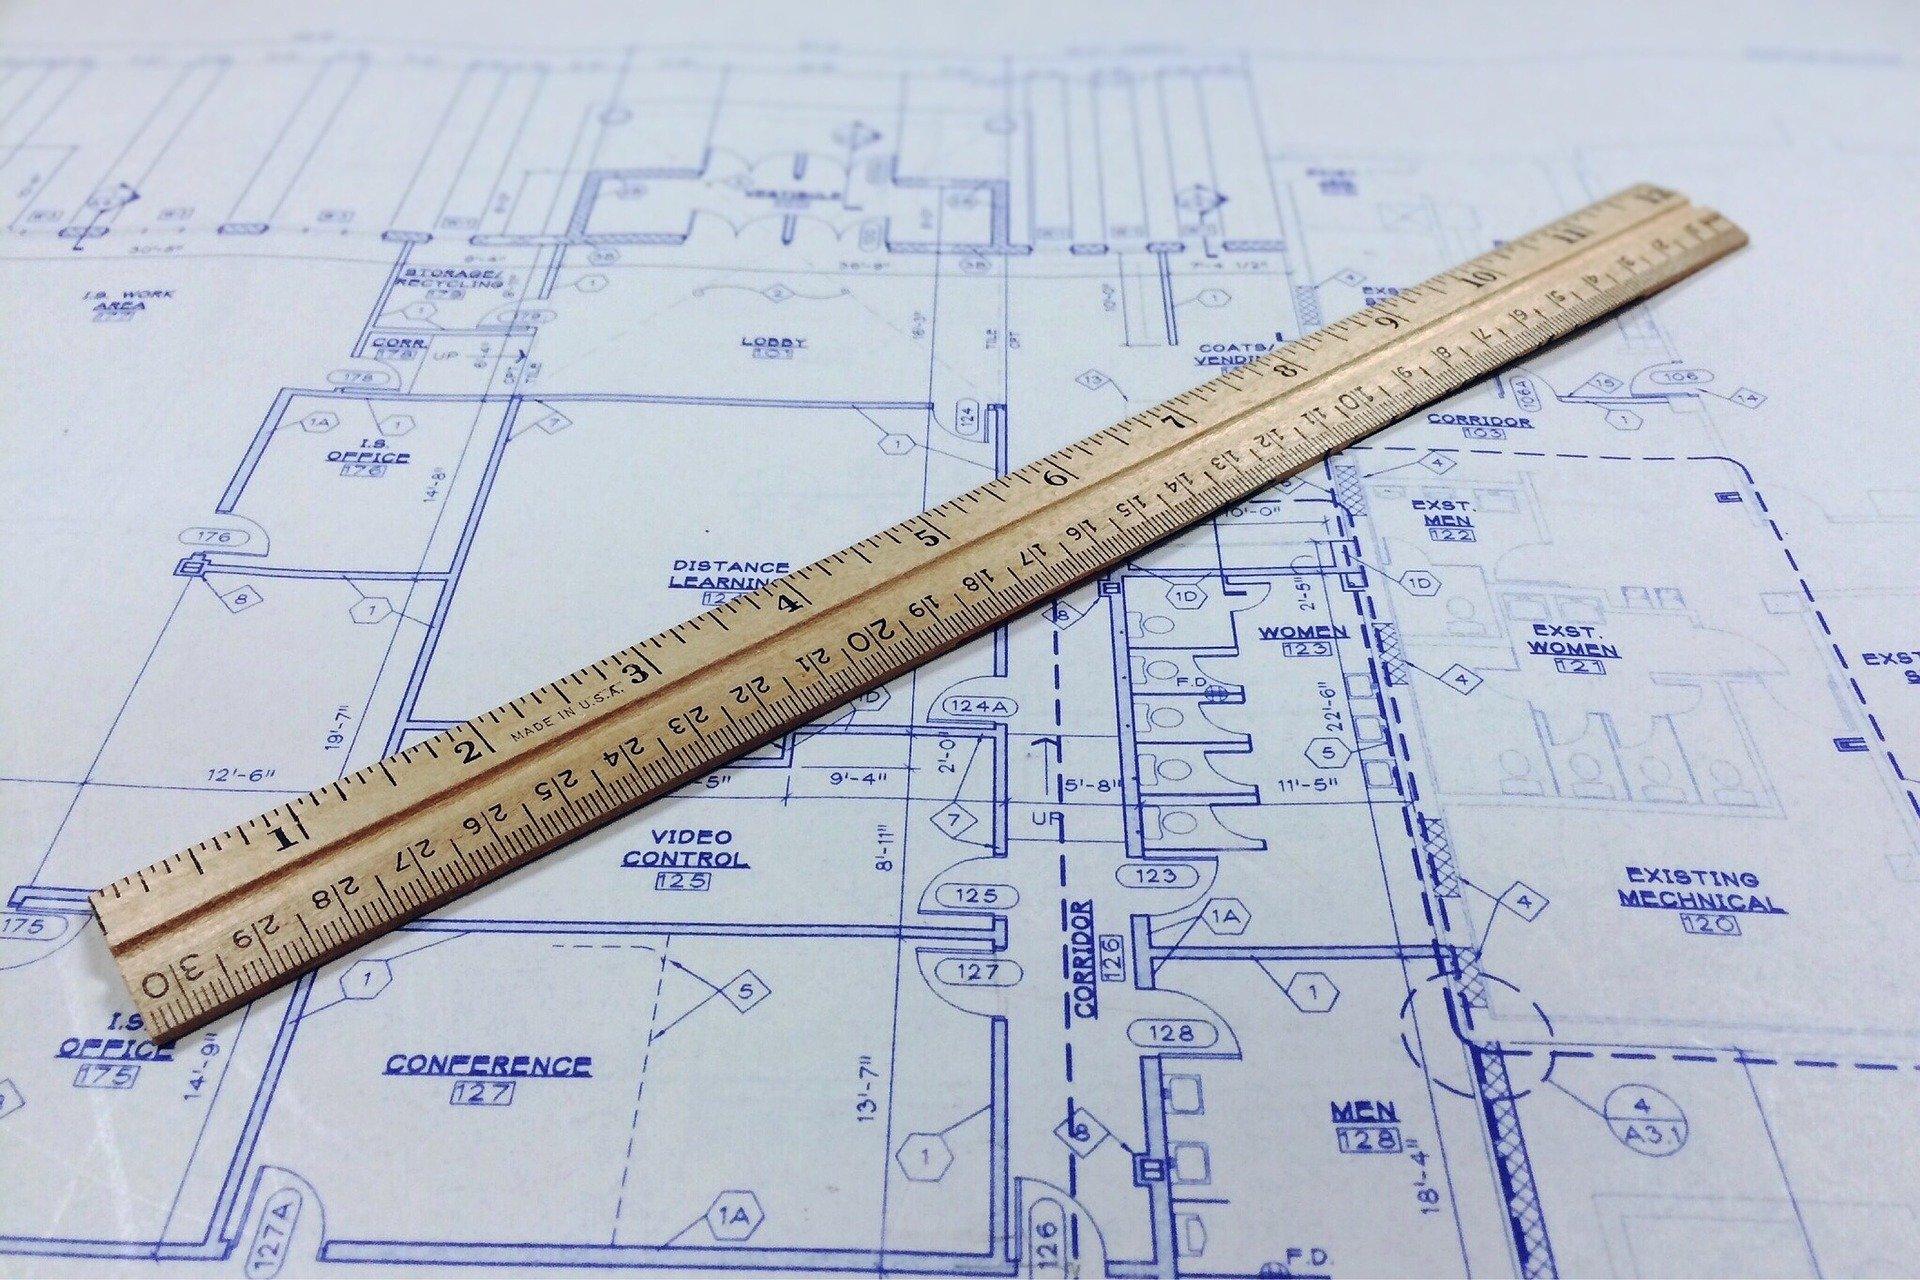 Ruler on a blueprint